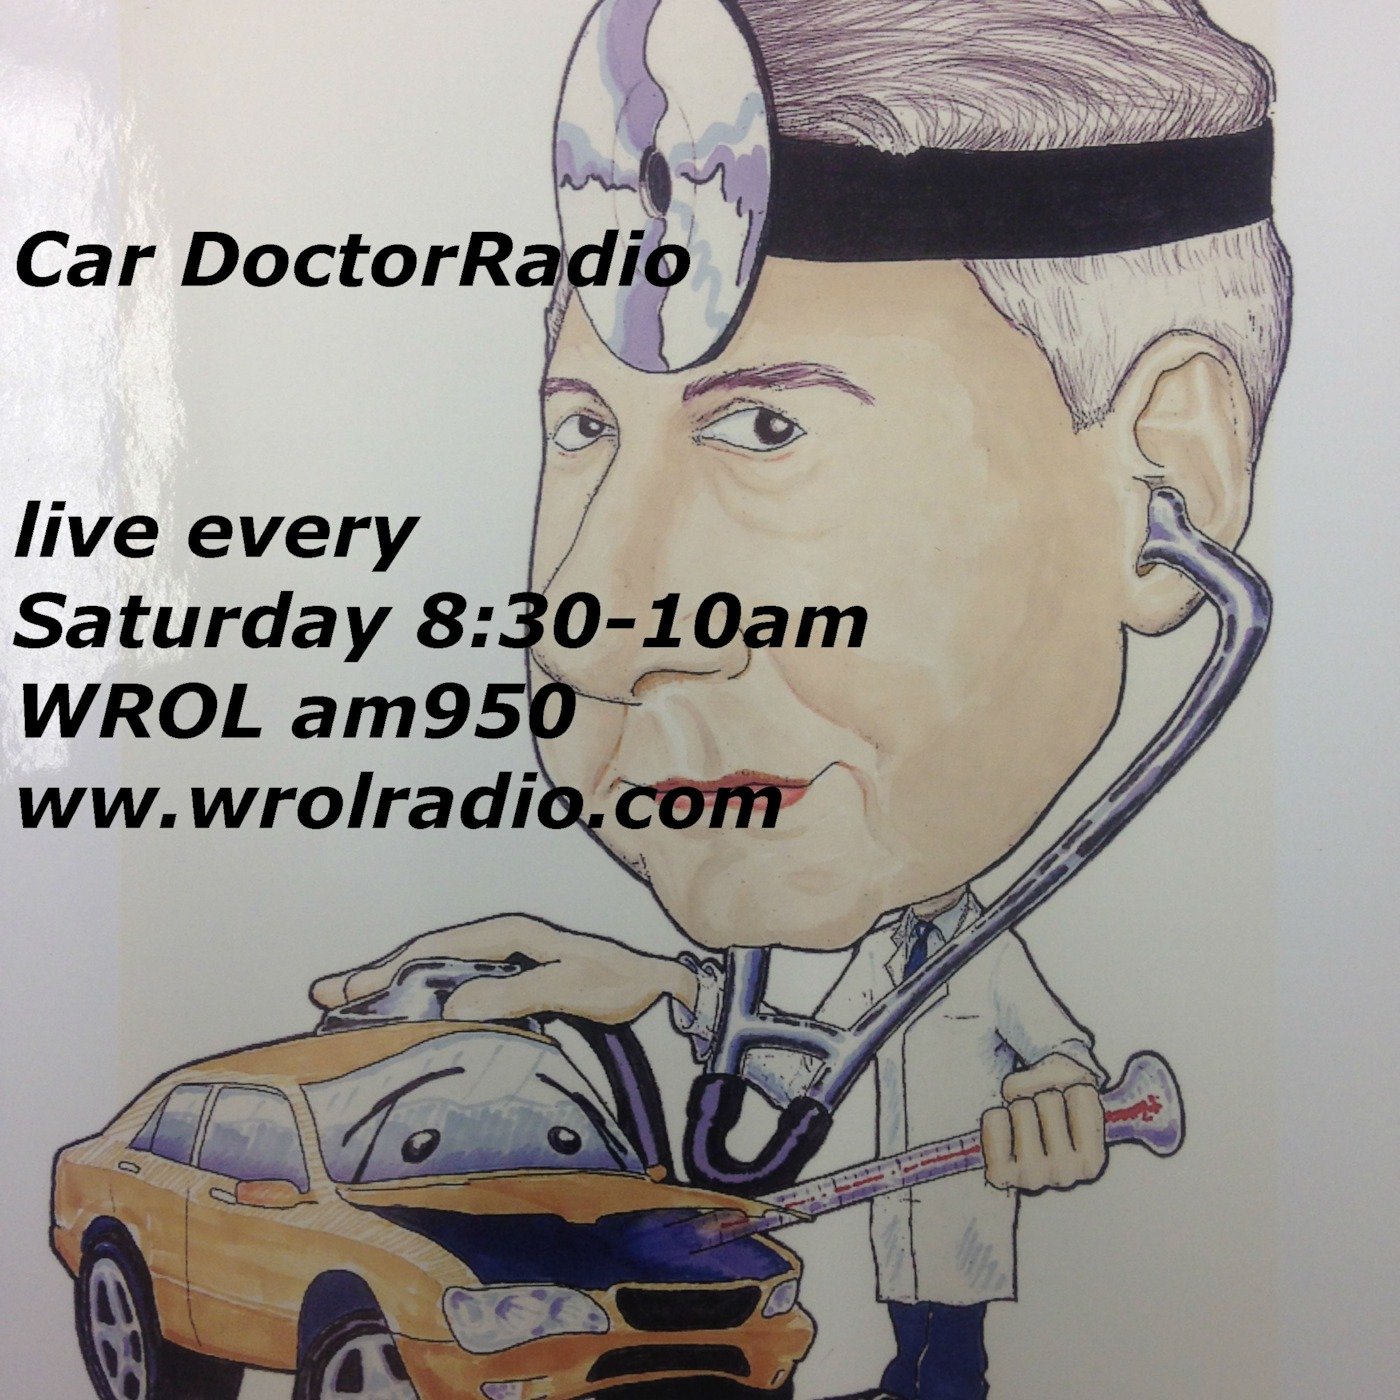 John Paul - Car Doctor Radio Podcast